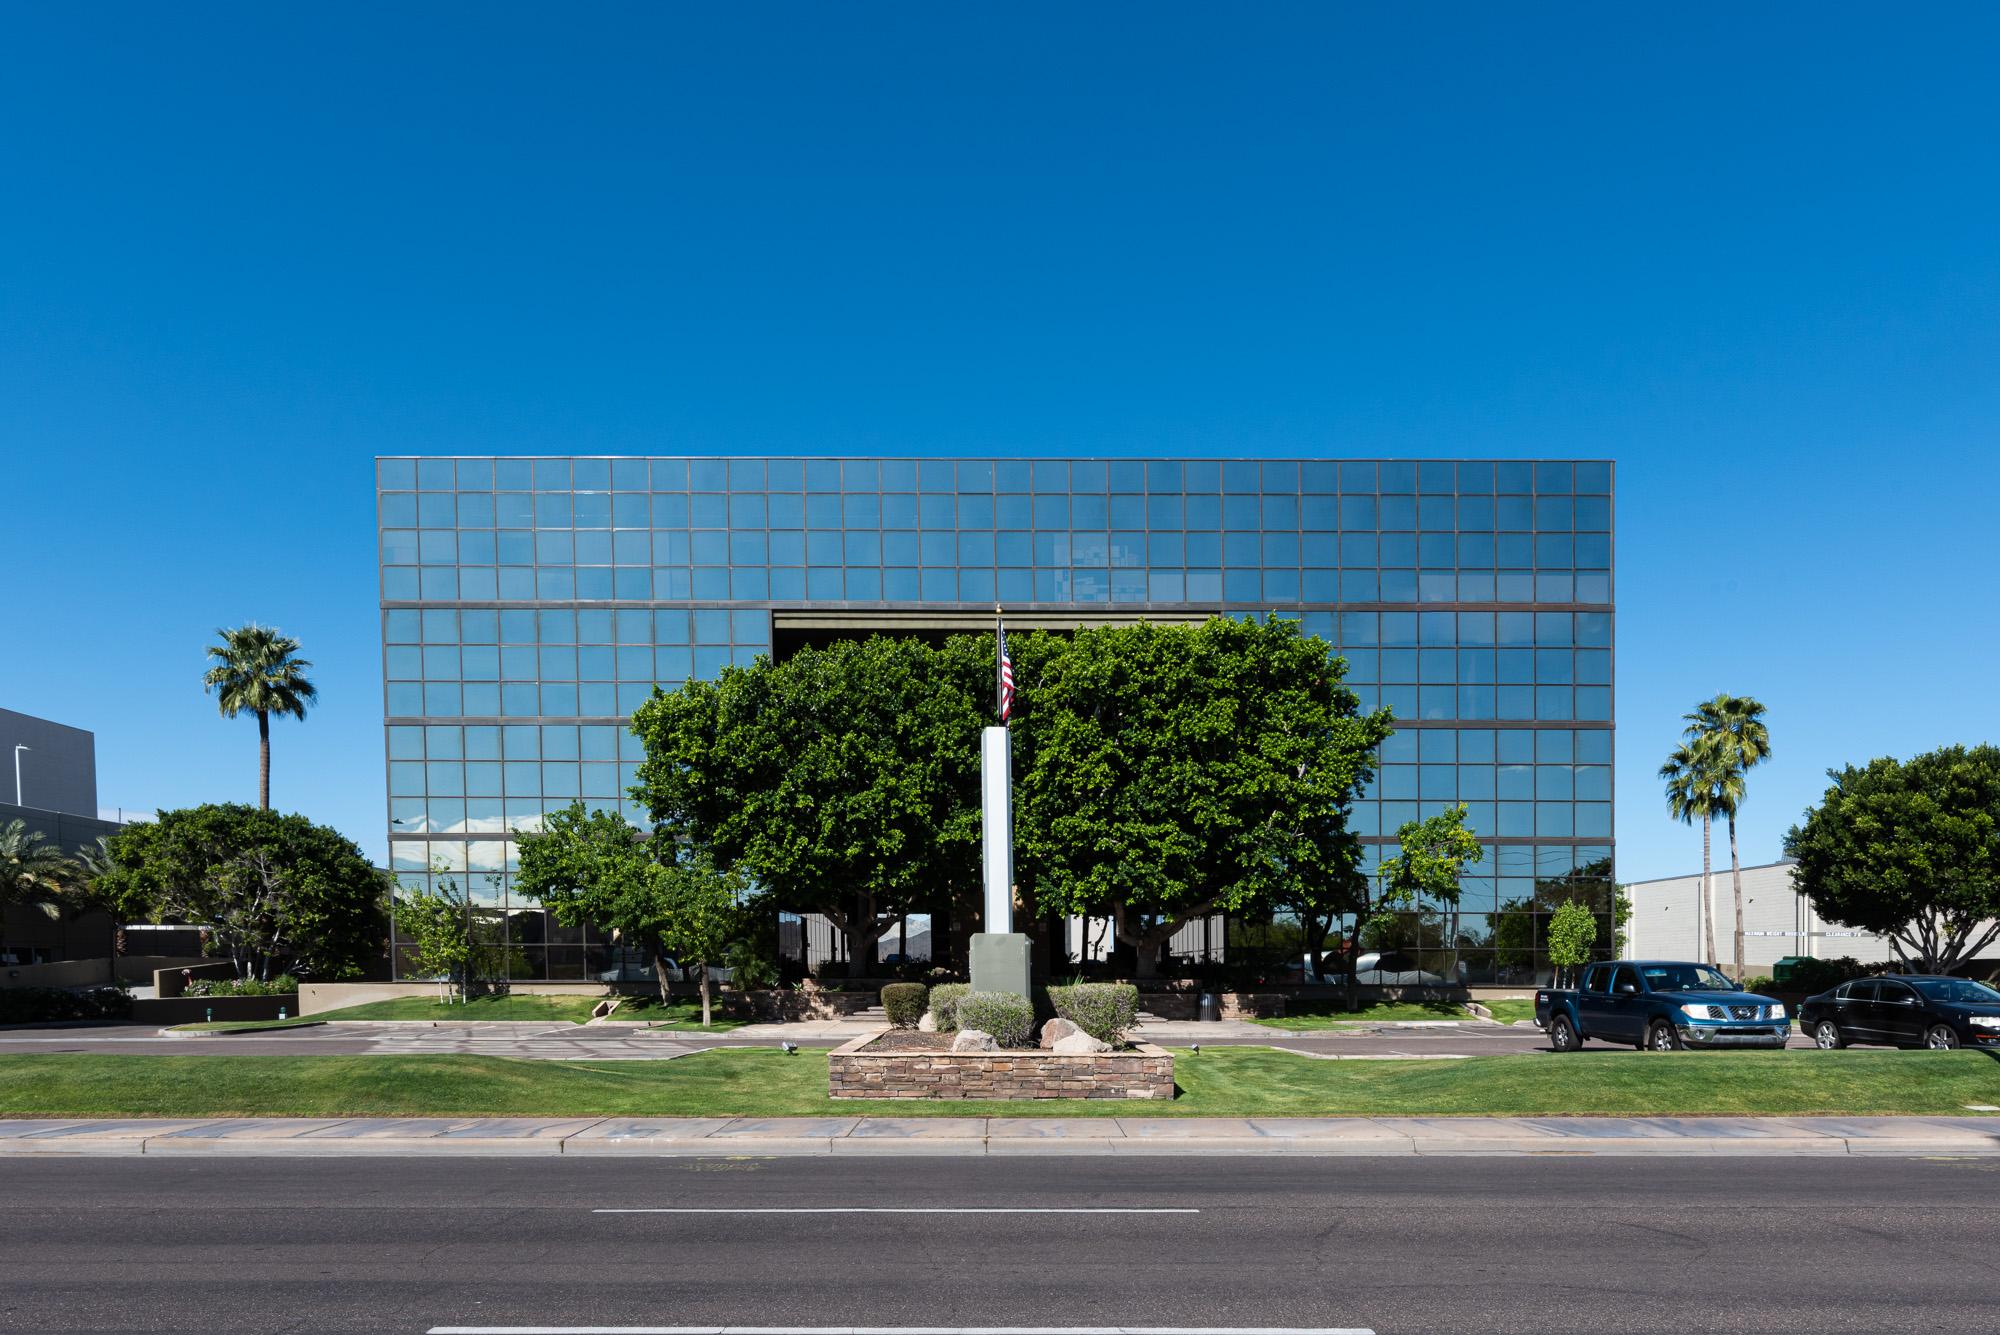 120 N. 44th Street Phoenix